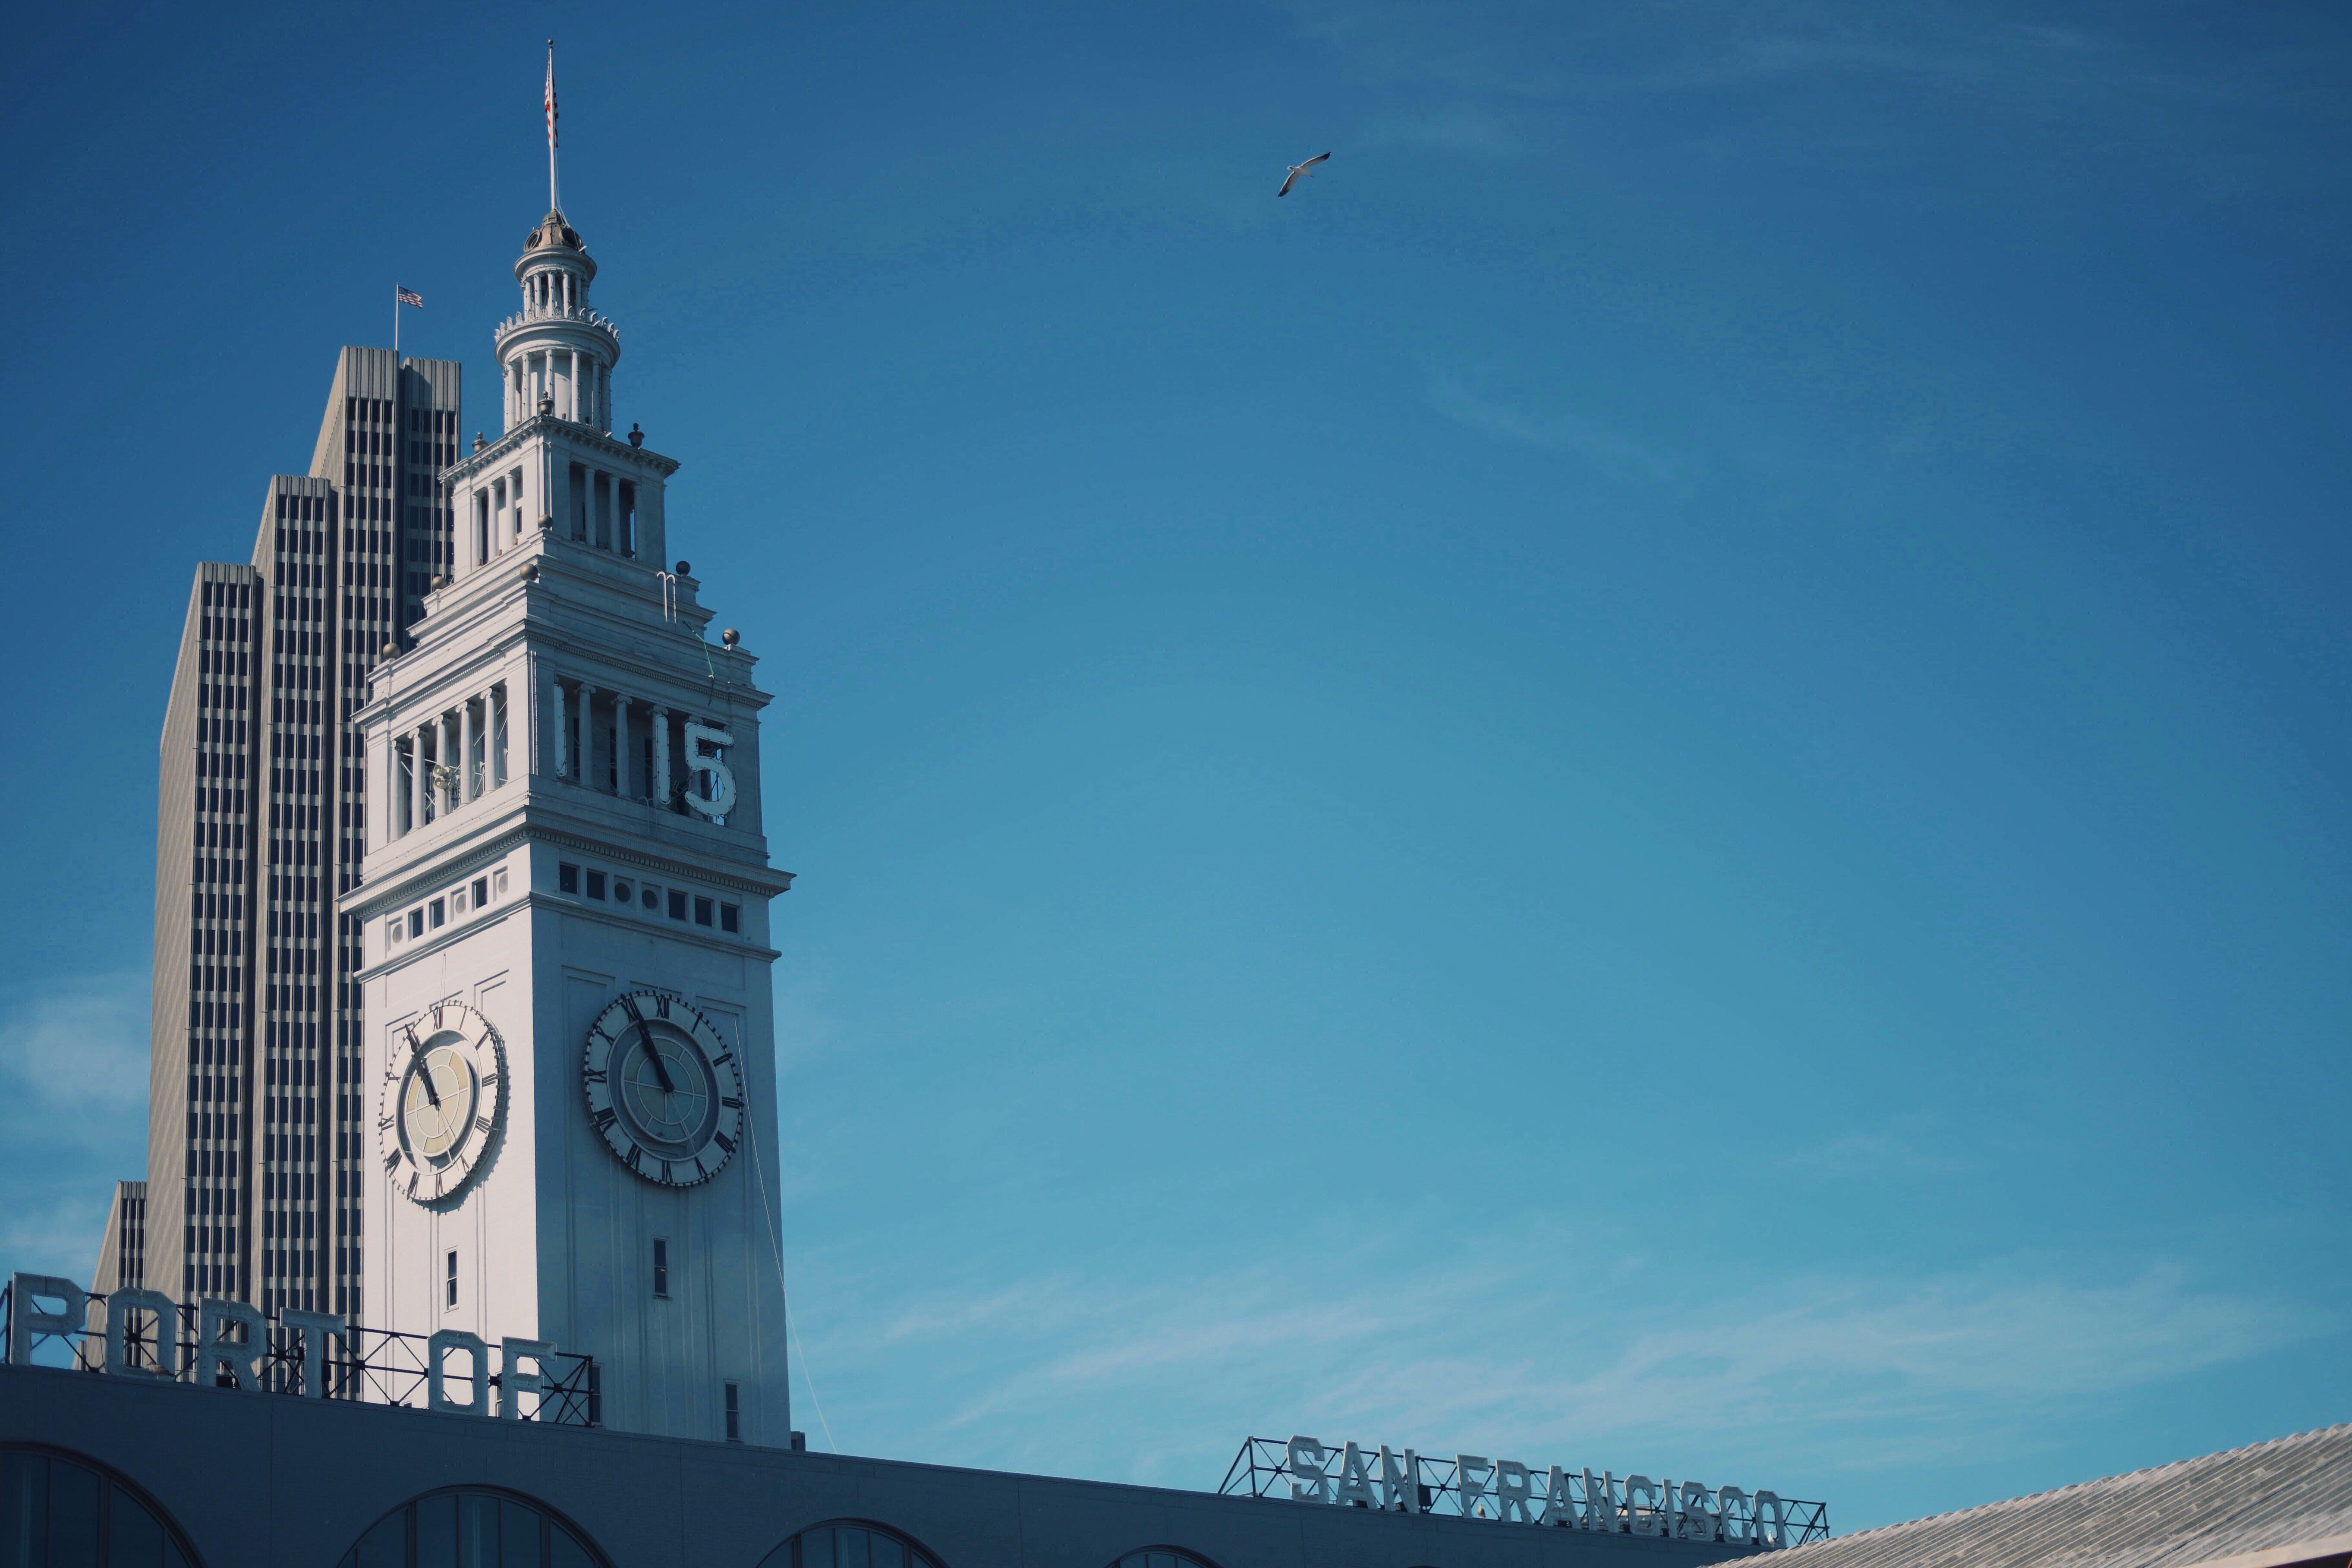 architecture, blue, blue sky